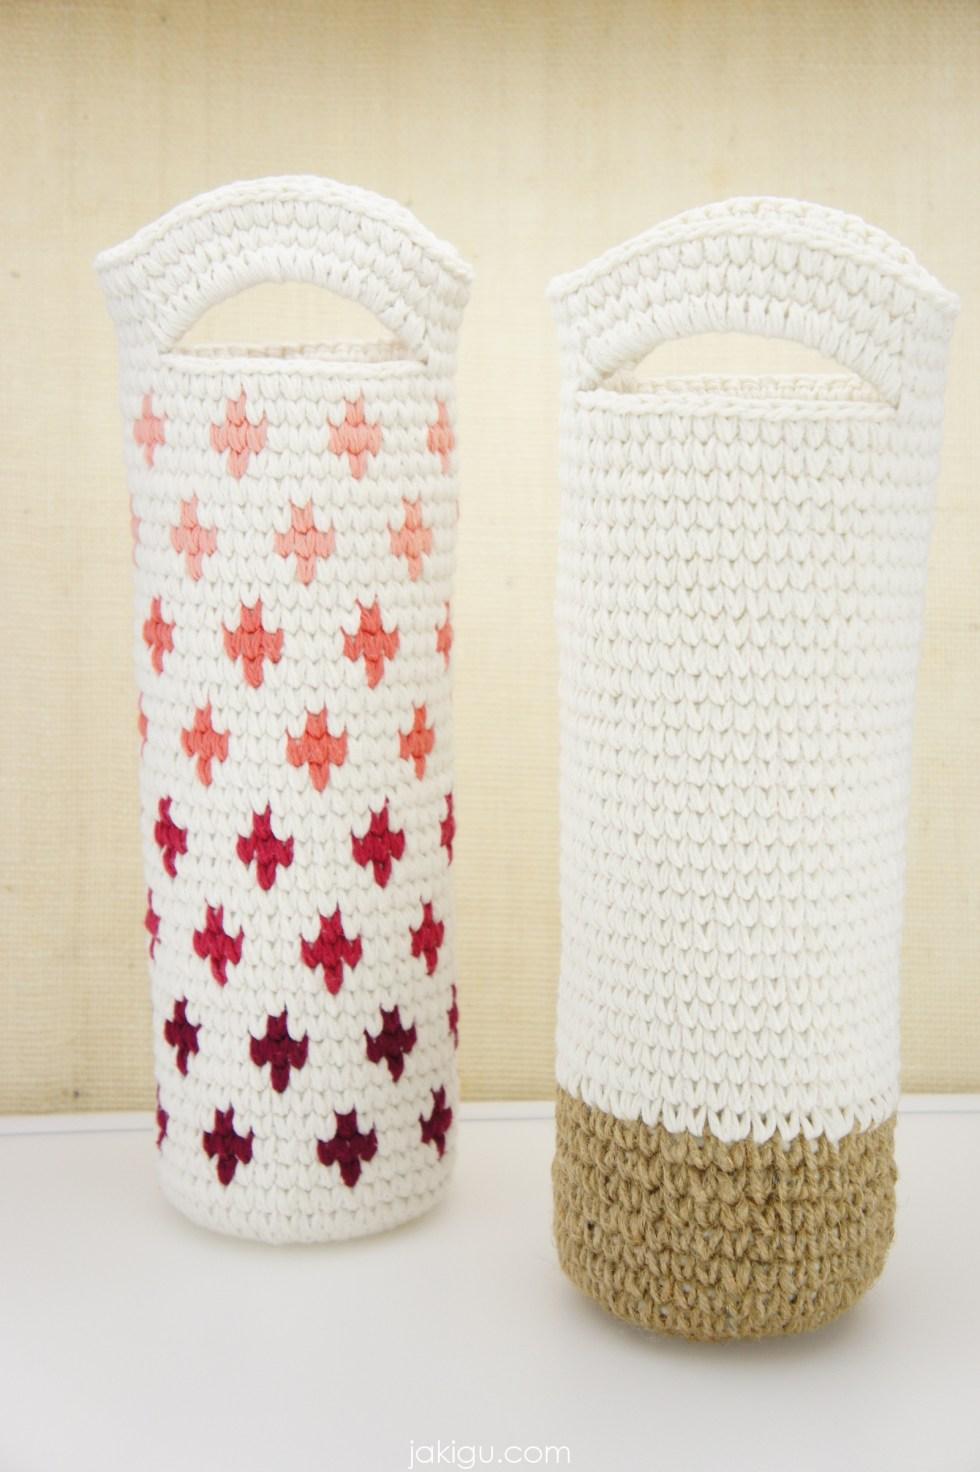 Crochet Wine Bottle Koozies / Cozies by jakigu.com